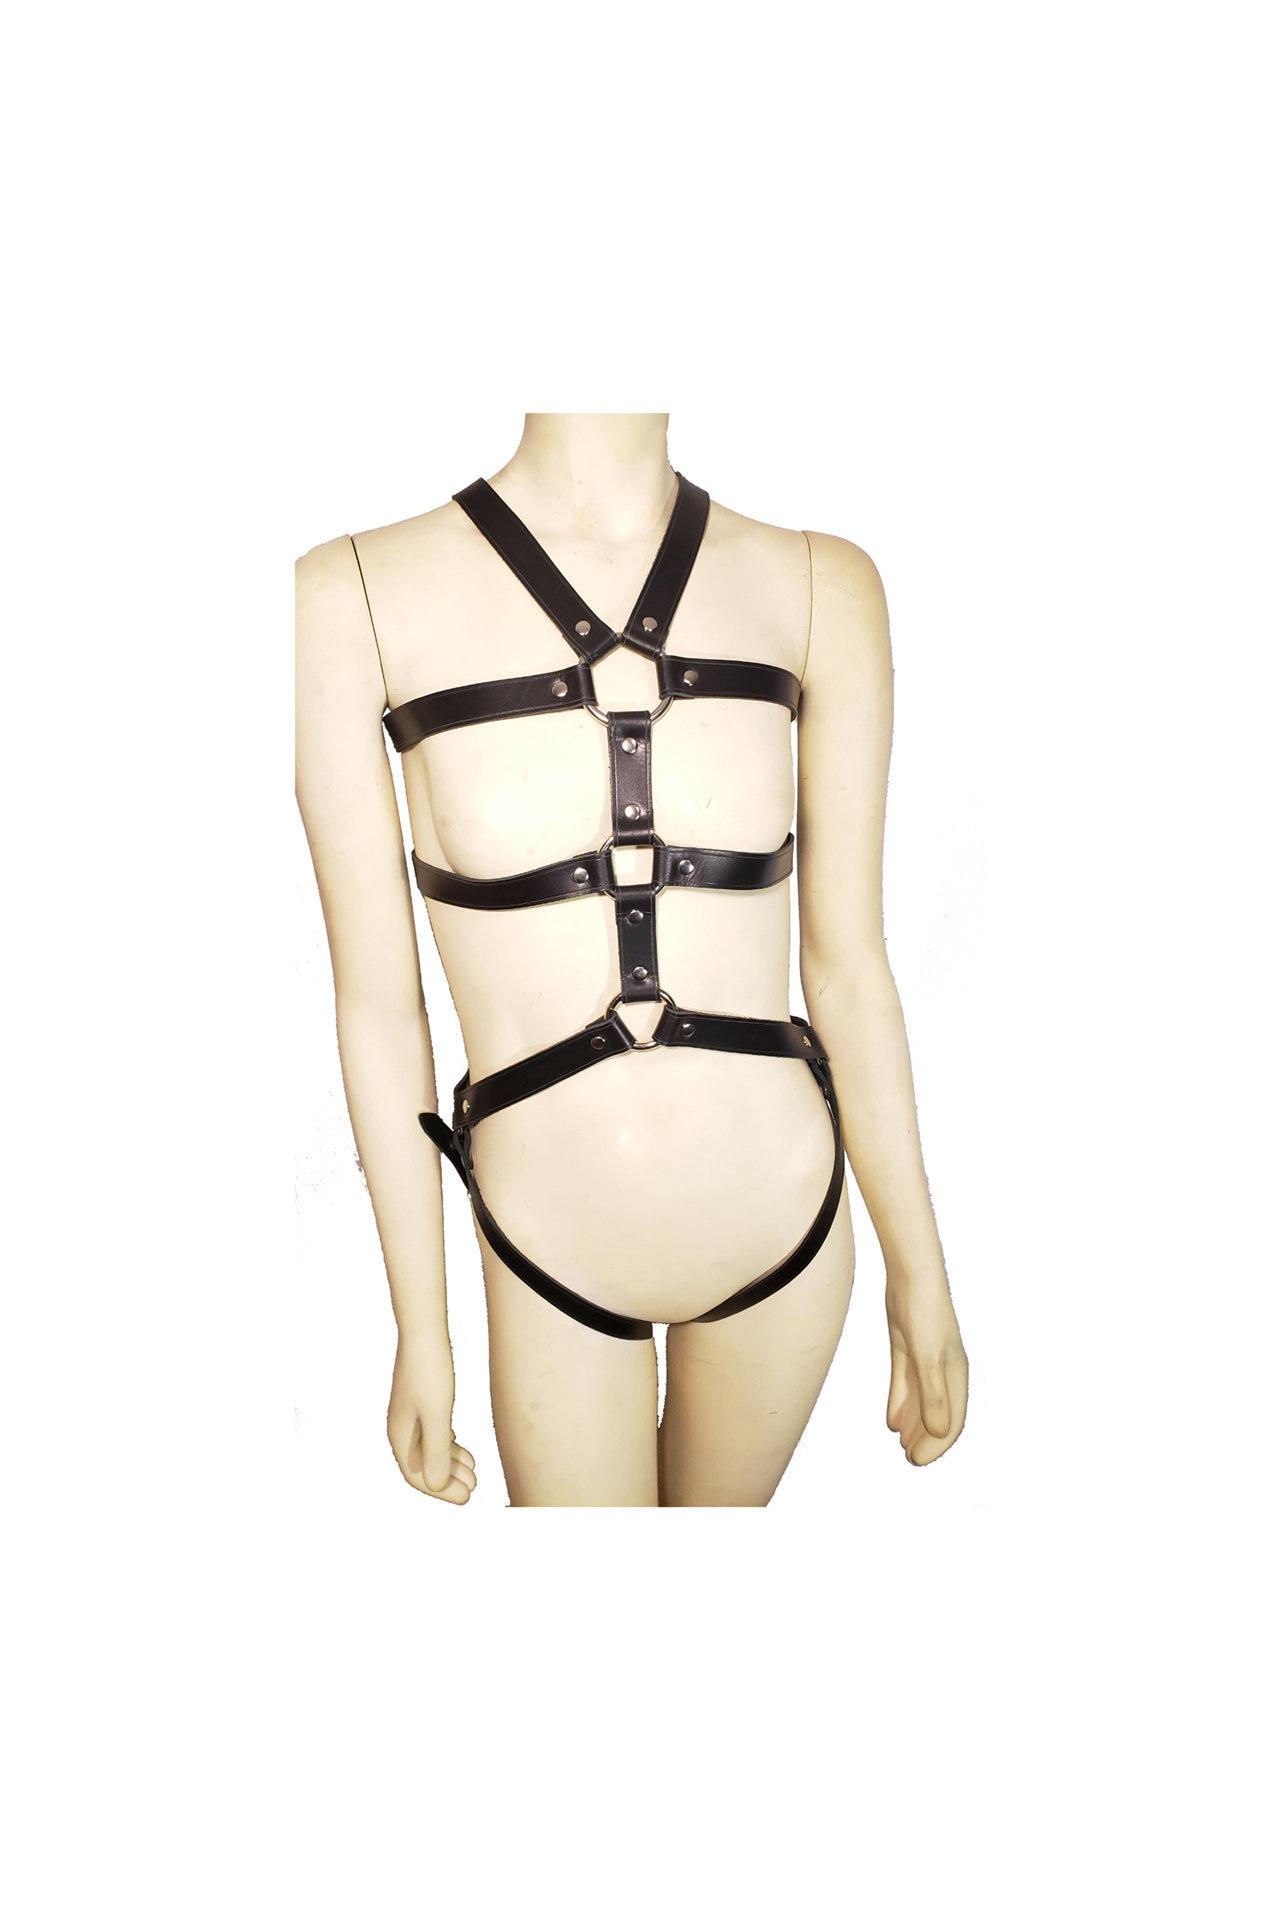 Man/'s Handmade Genuine Leather Full Body Harness